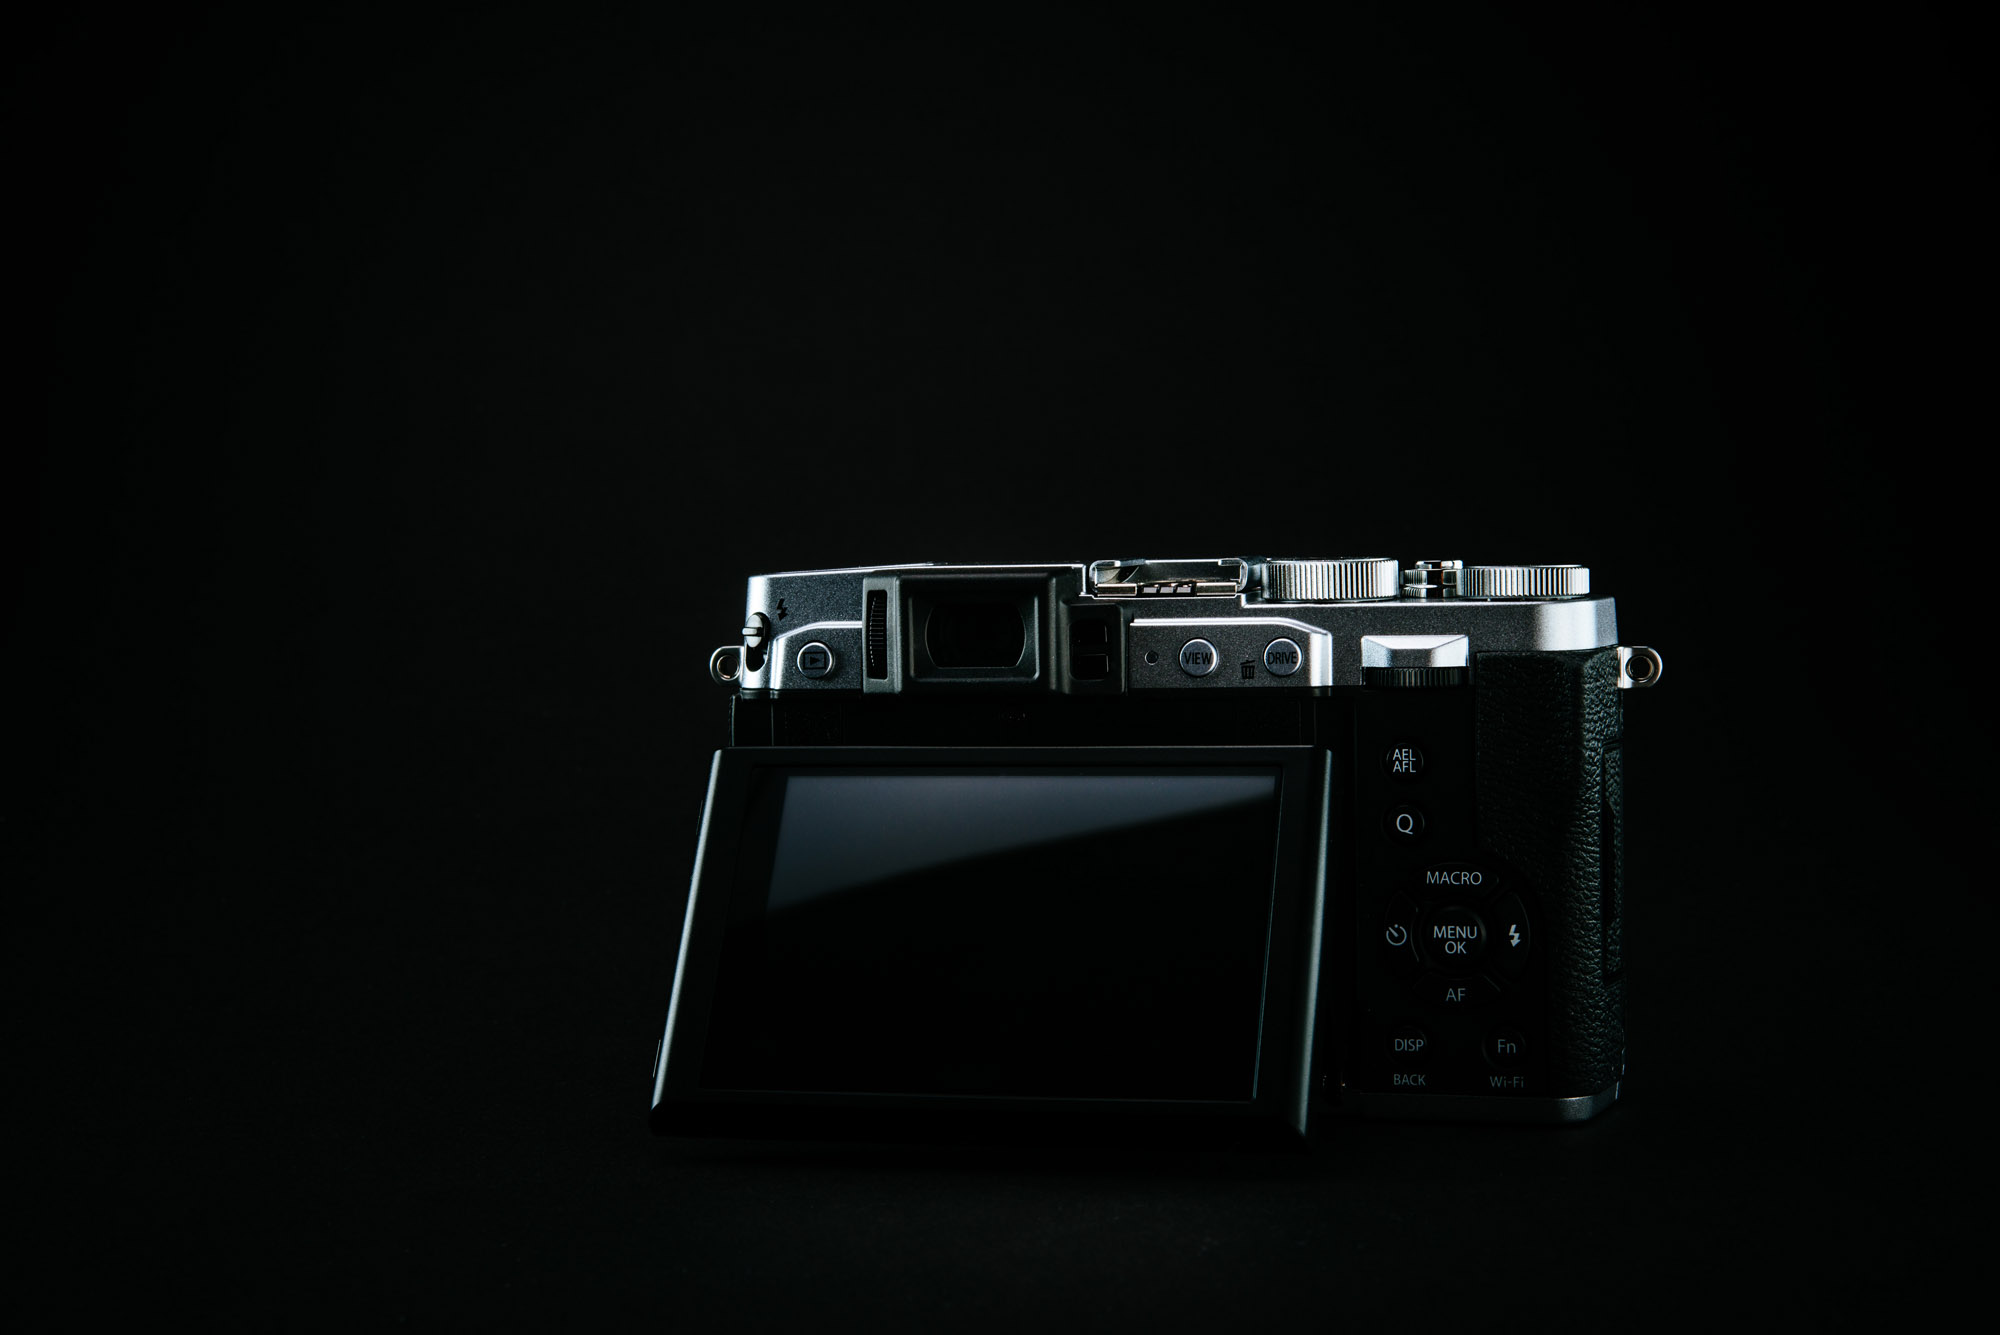 fujifilm-x30-review-03